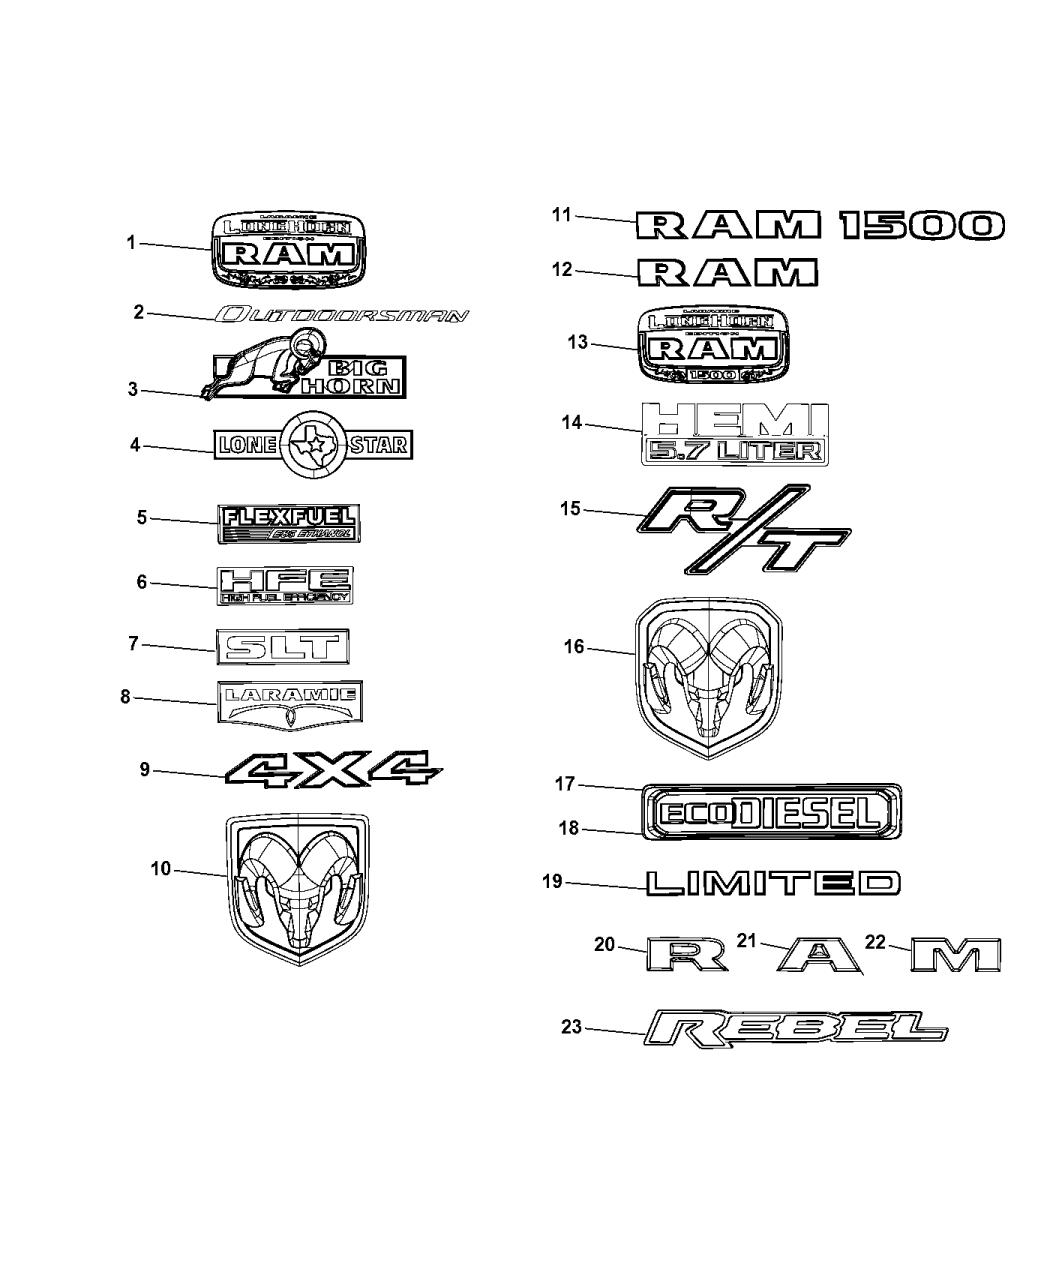 2015 Ram 1500 Nameplates Emblem Medallions M1b Condenser Wiring Diagram